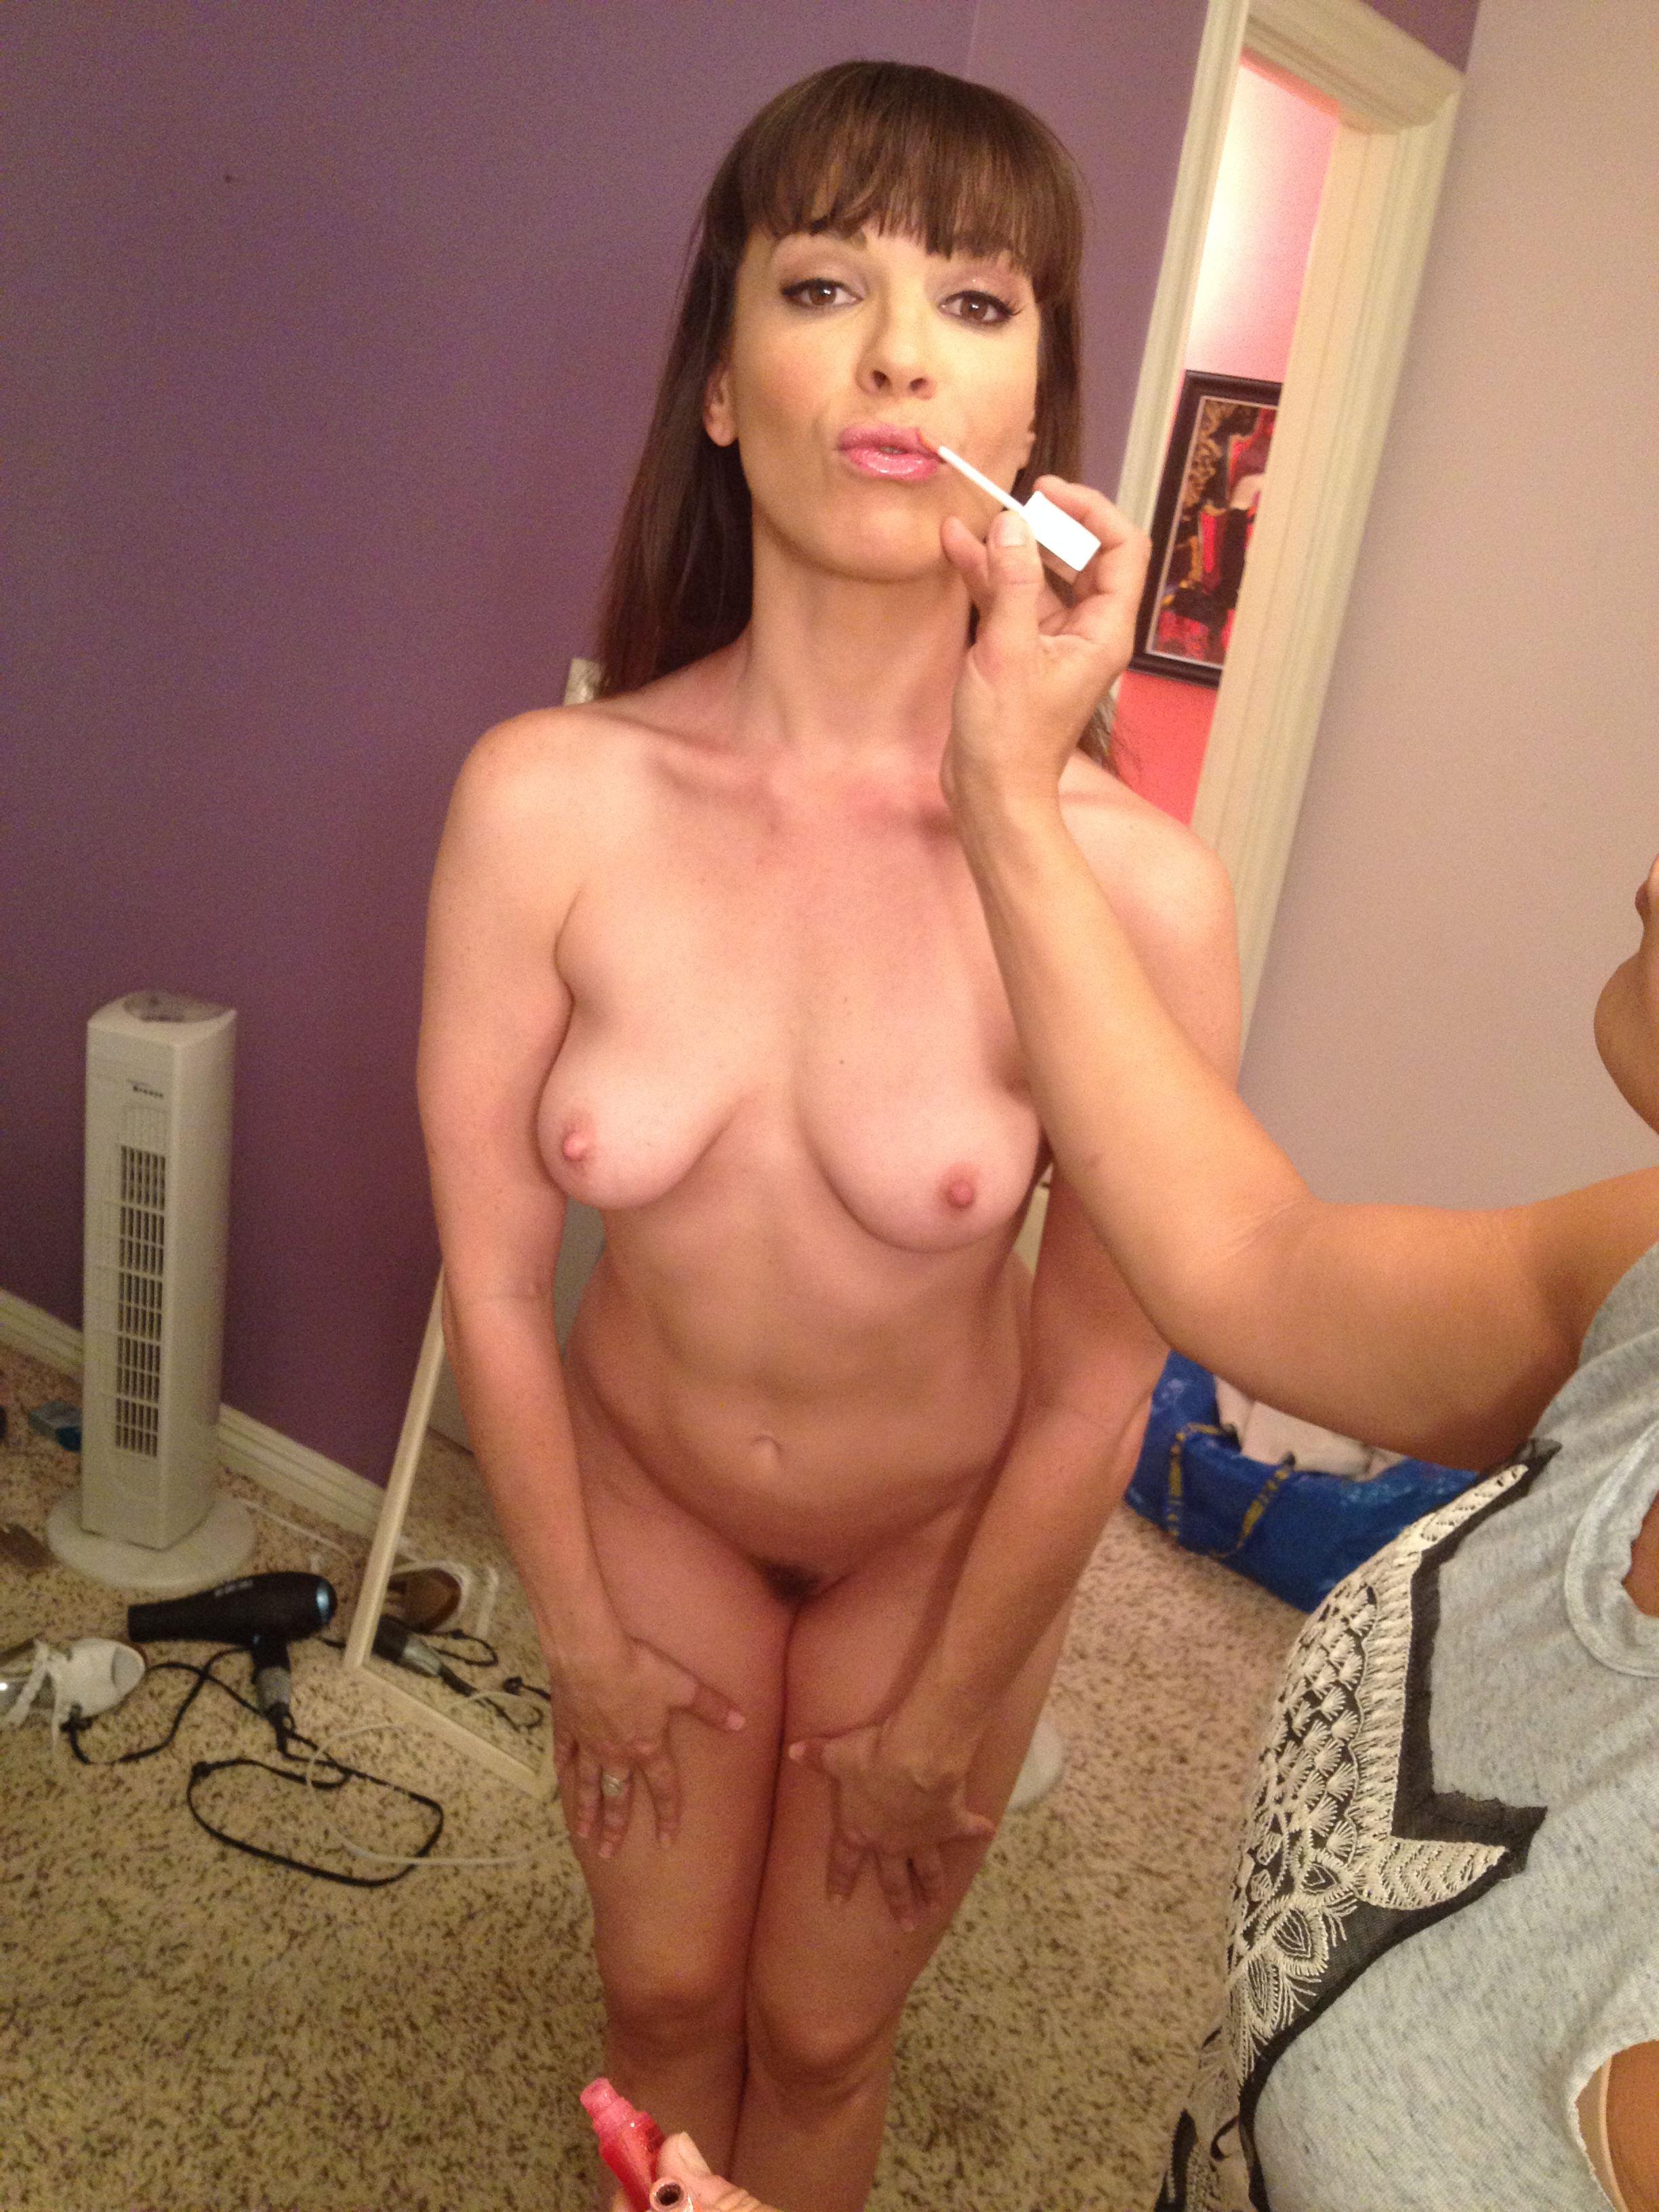 Nadia Styles Donna Dana Dearmond Porn the second blog of, dana dearmond the woman of two blogs